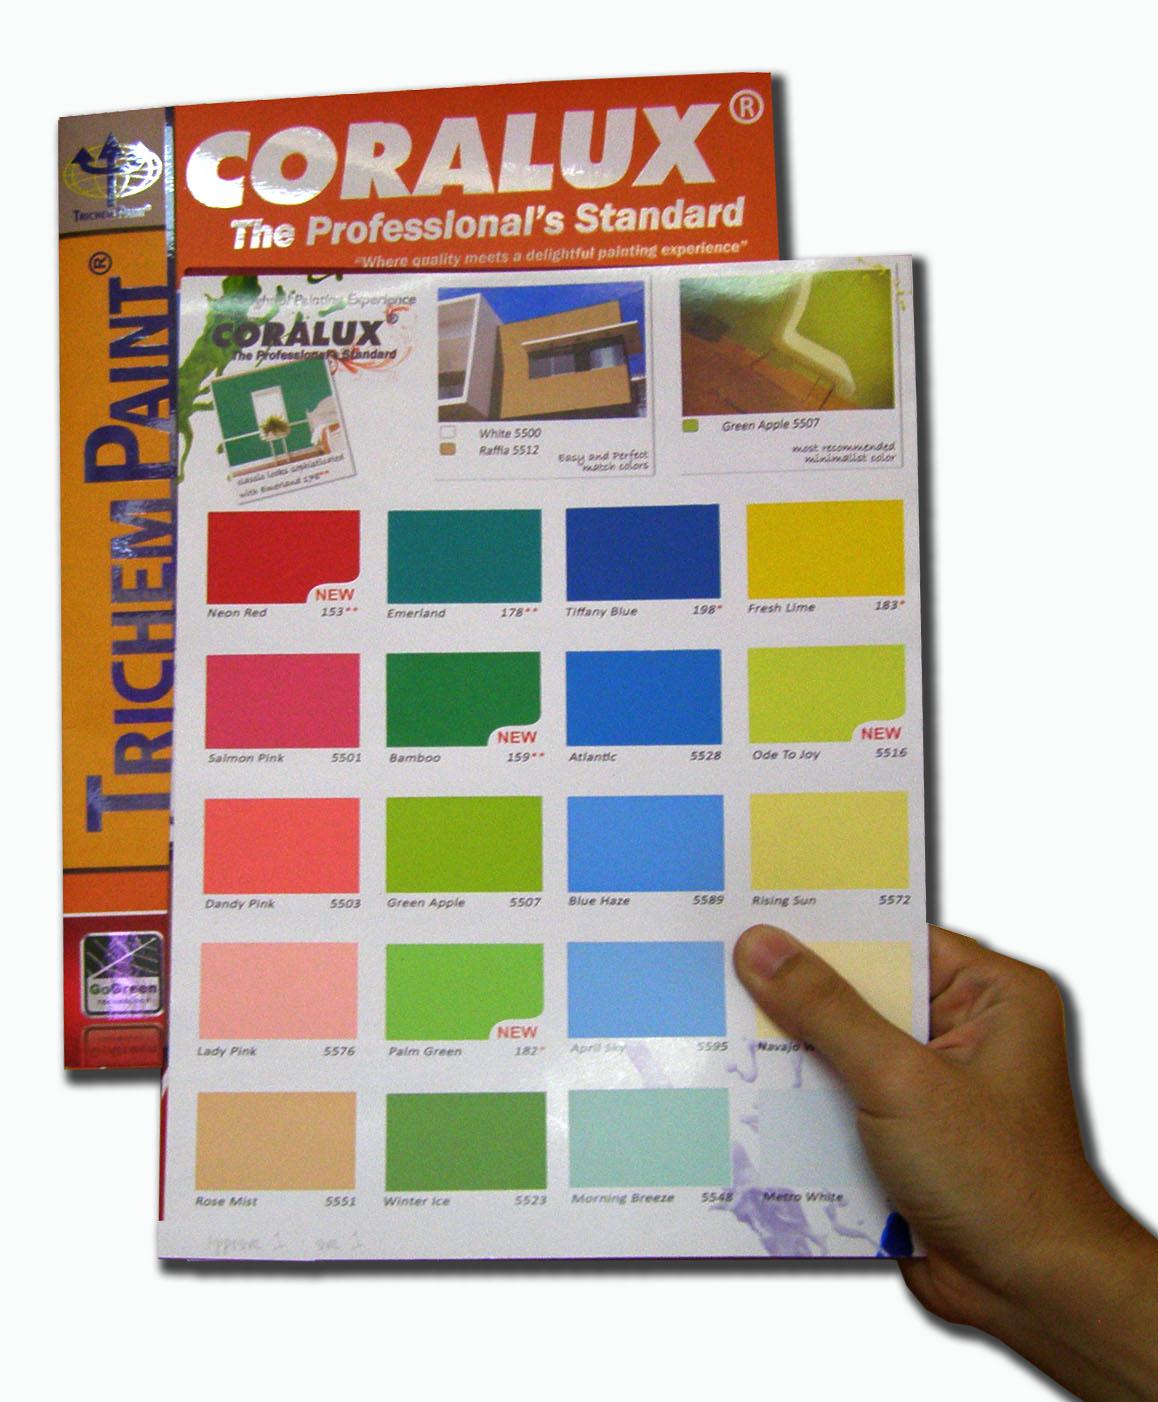 sukses mandiri teknik contoh gambar warna cat rumah